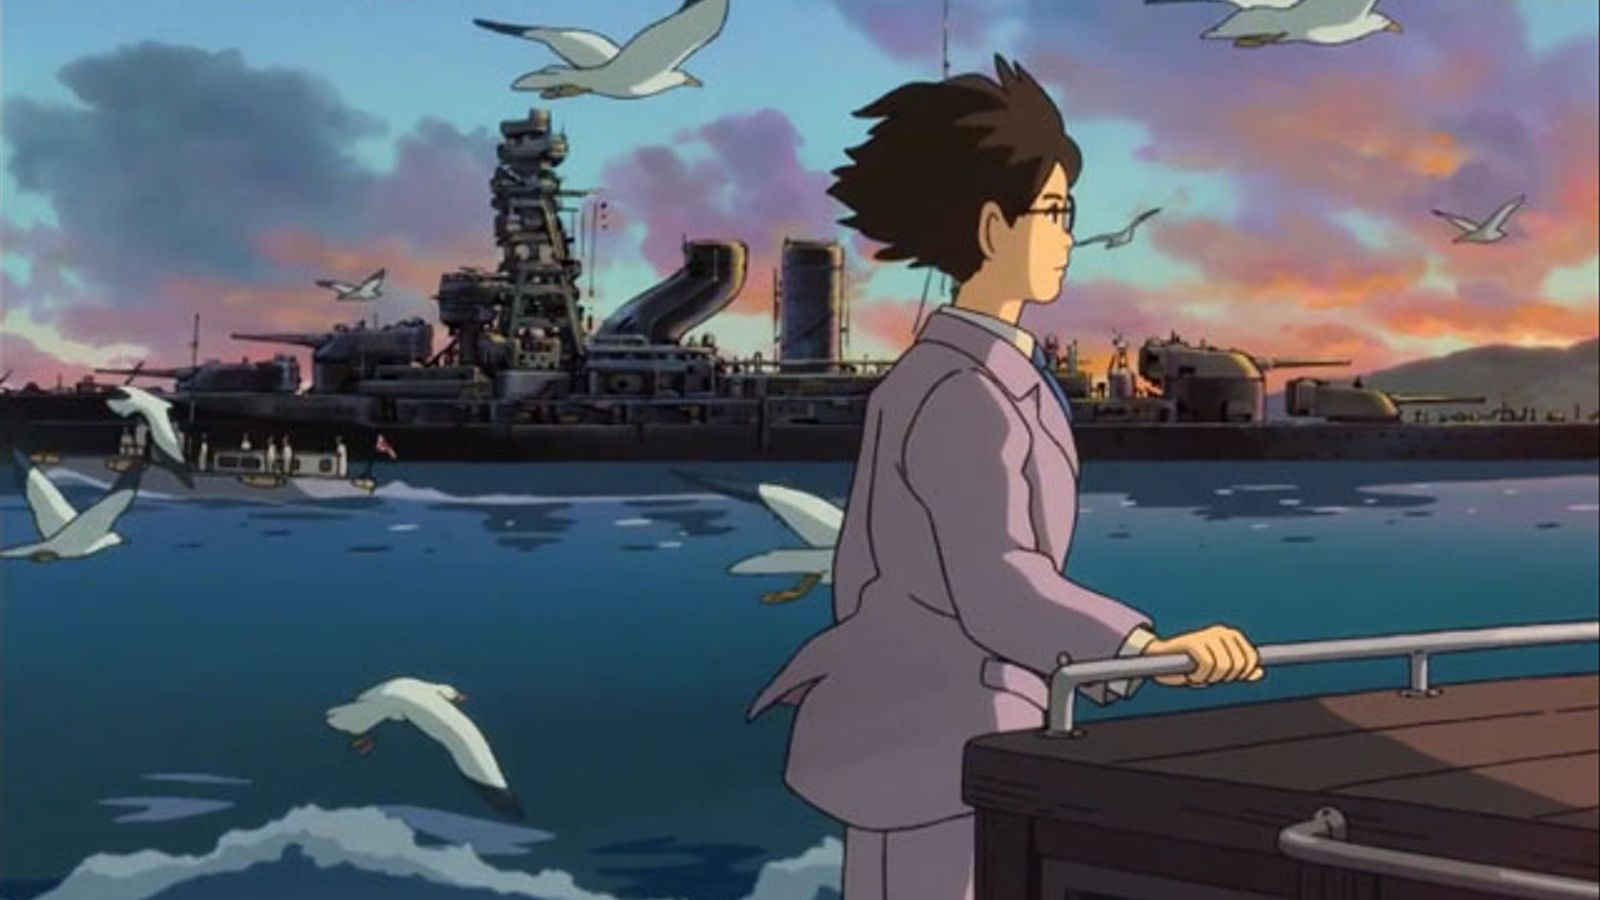 Trailer de 'The wind rises', de Hayao Miyazaki